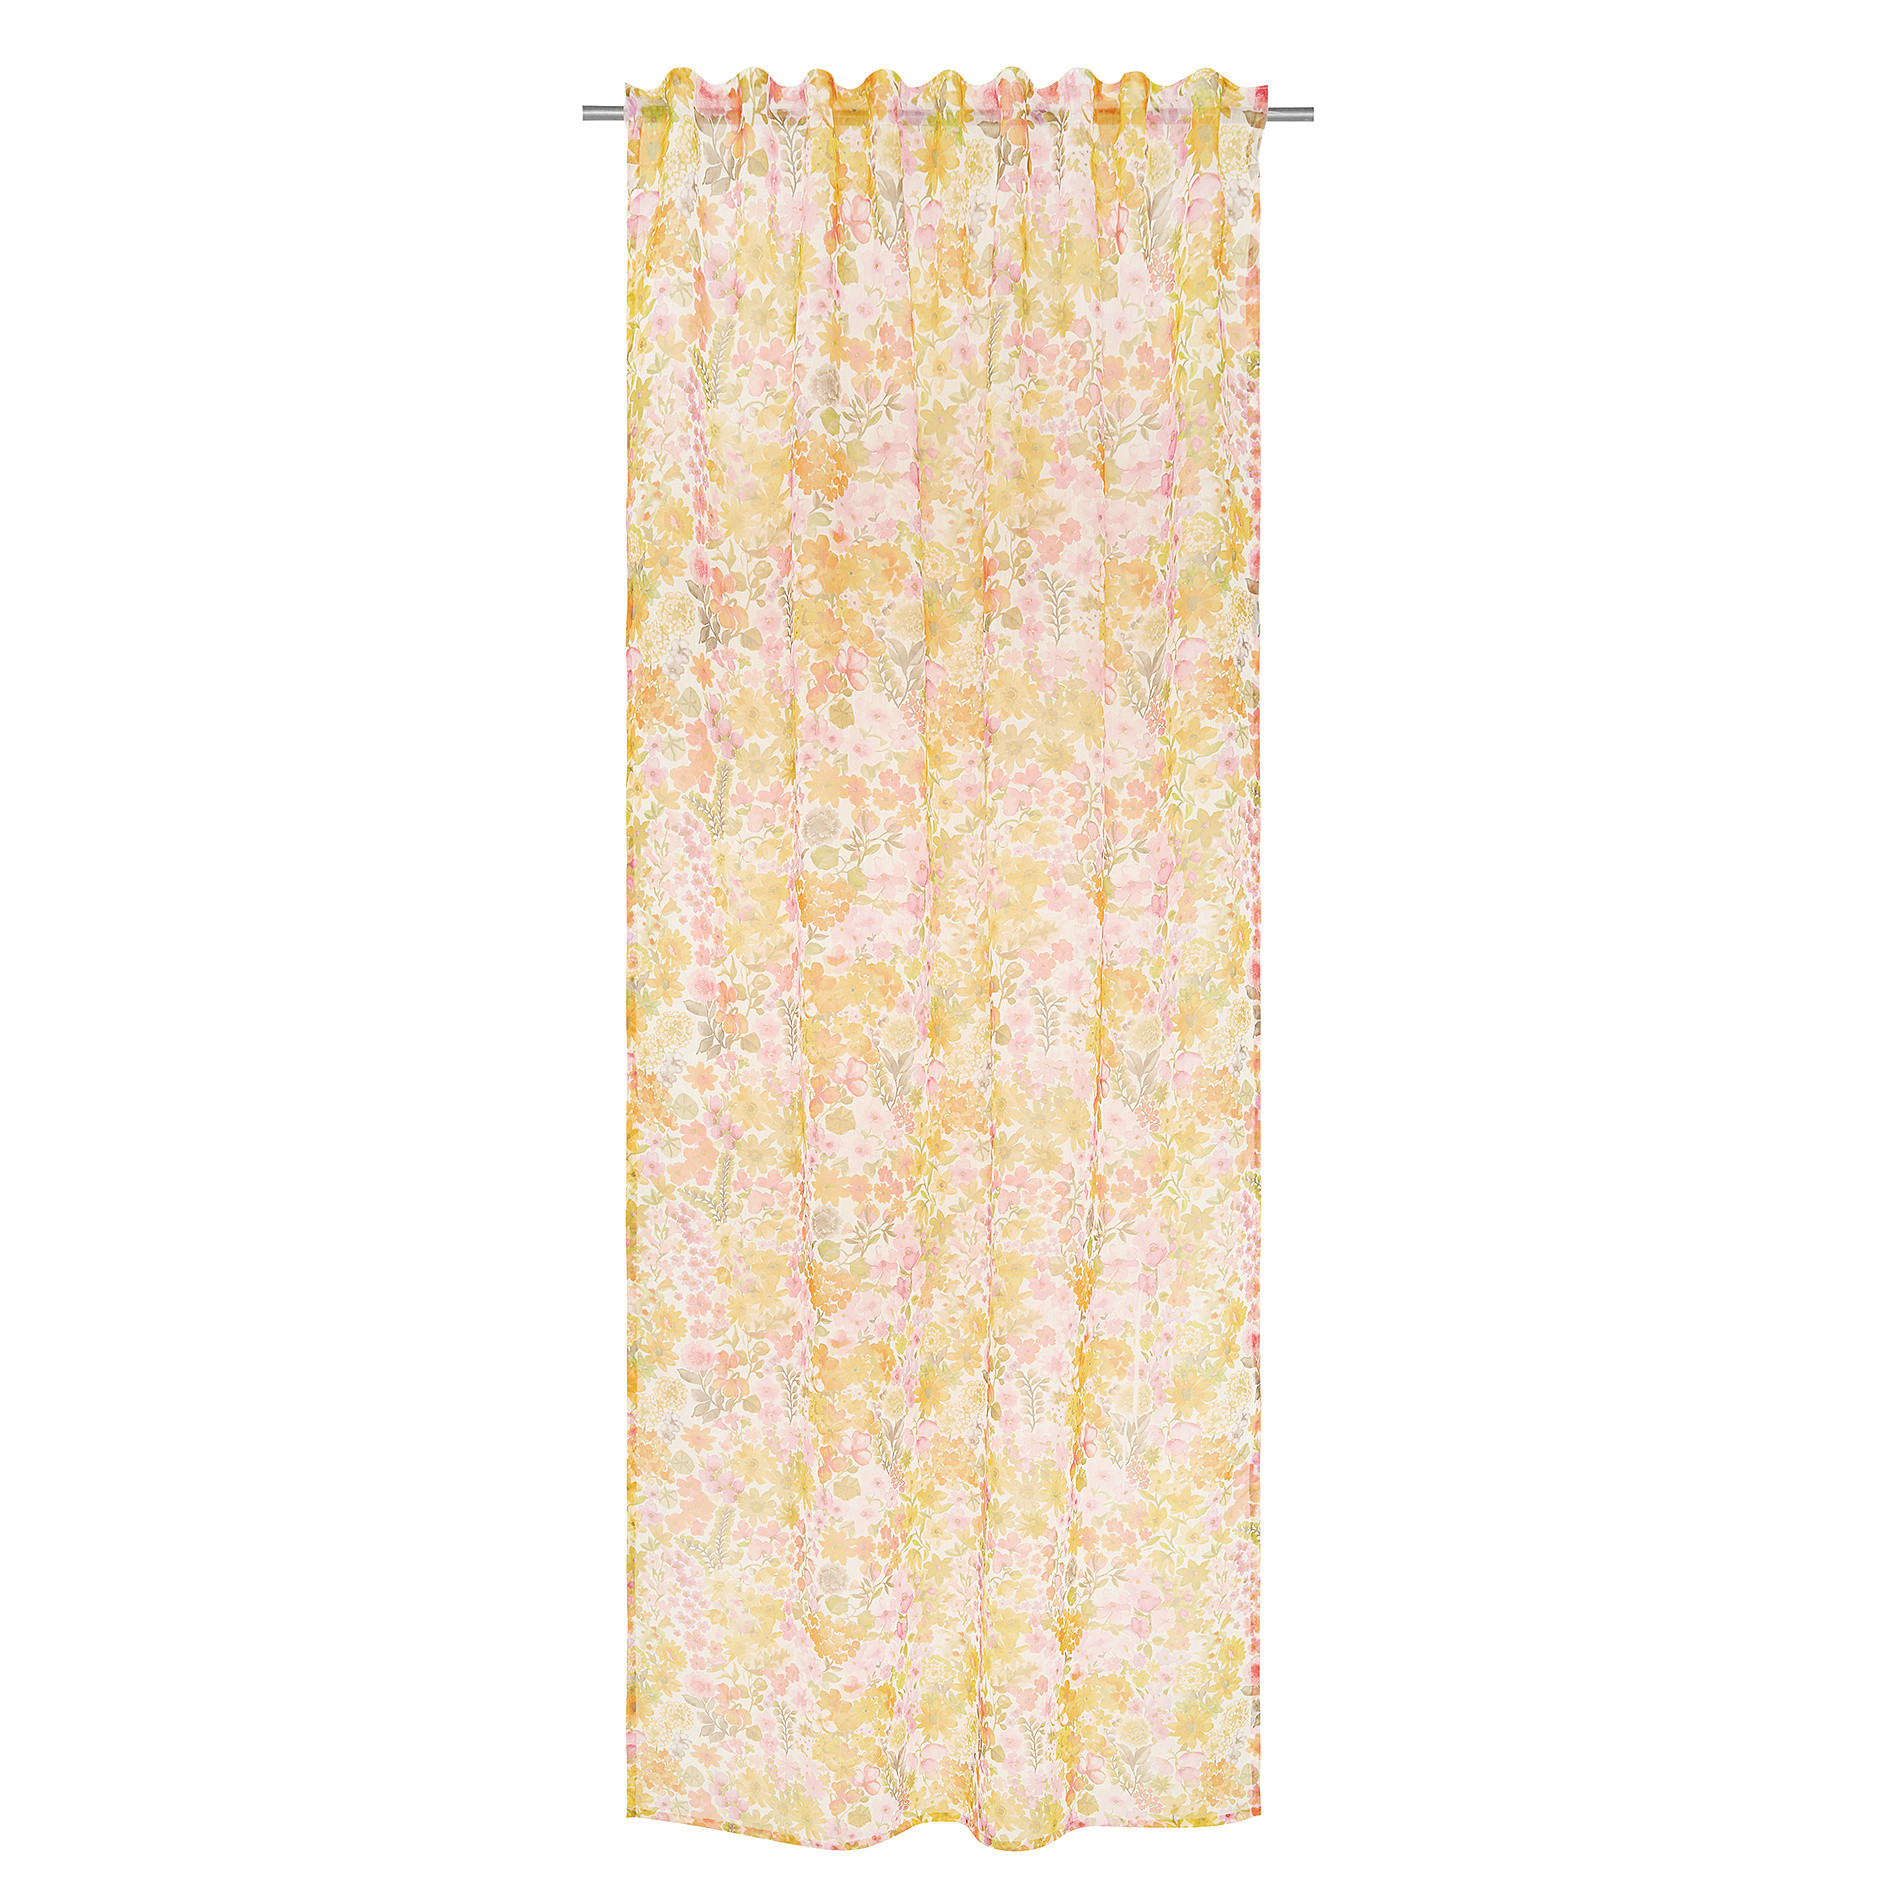 Tenda stampa floreale passanti nascosti, Multicolor, large image number 1